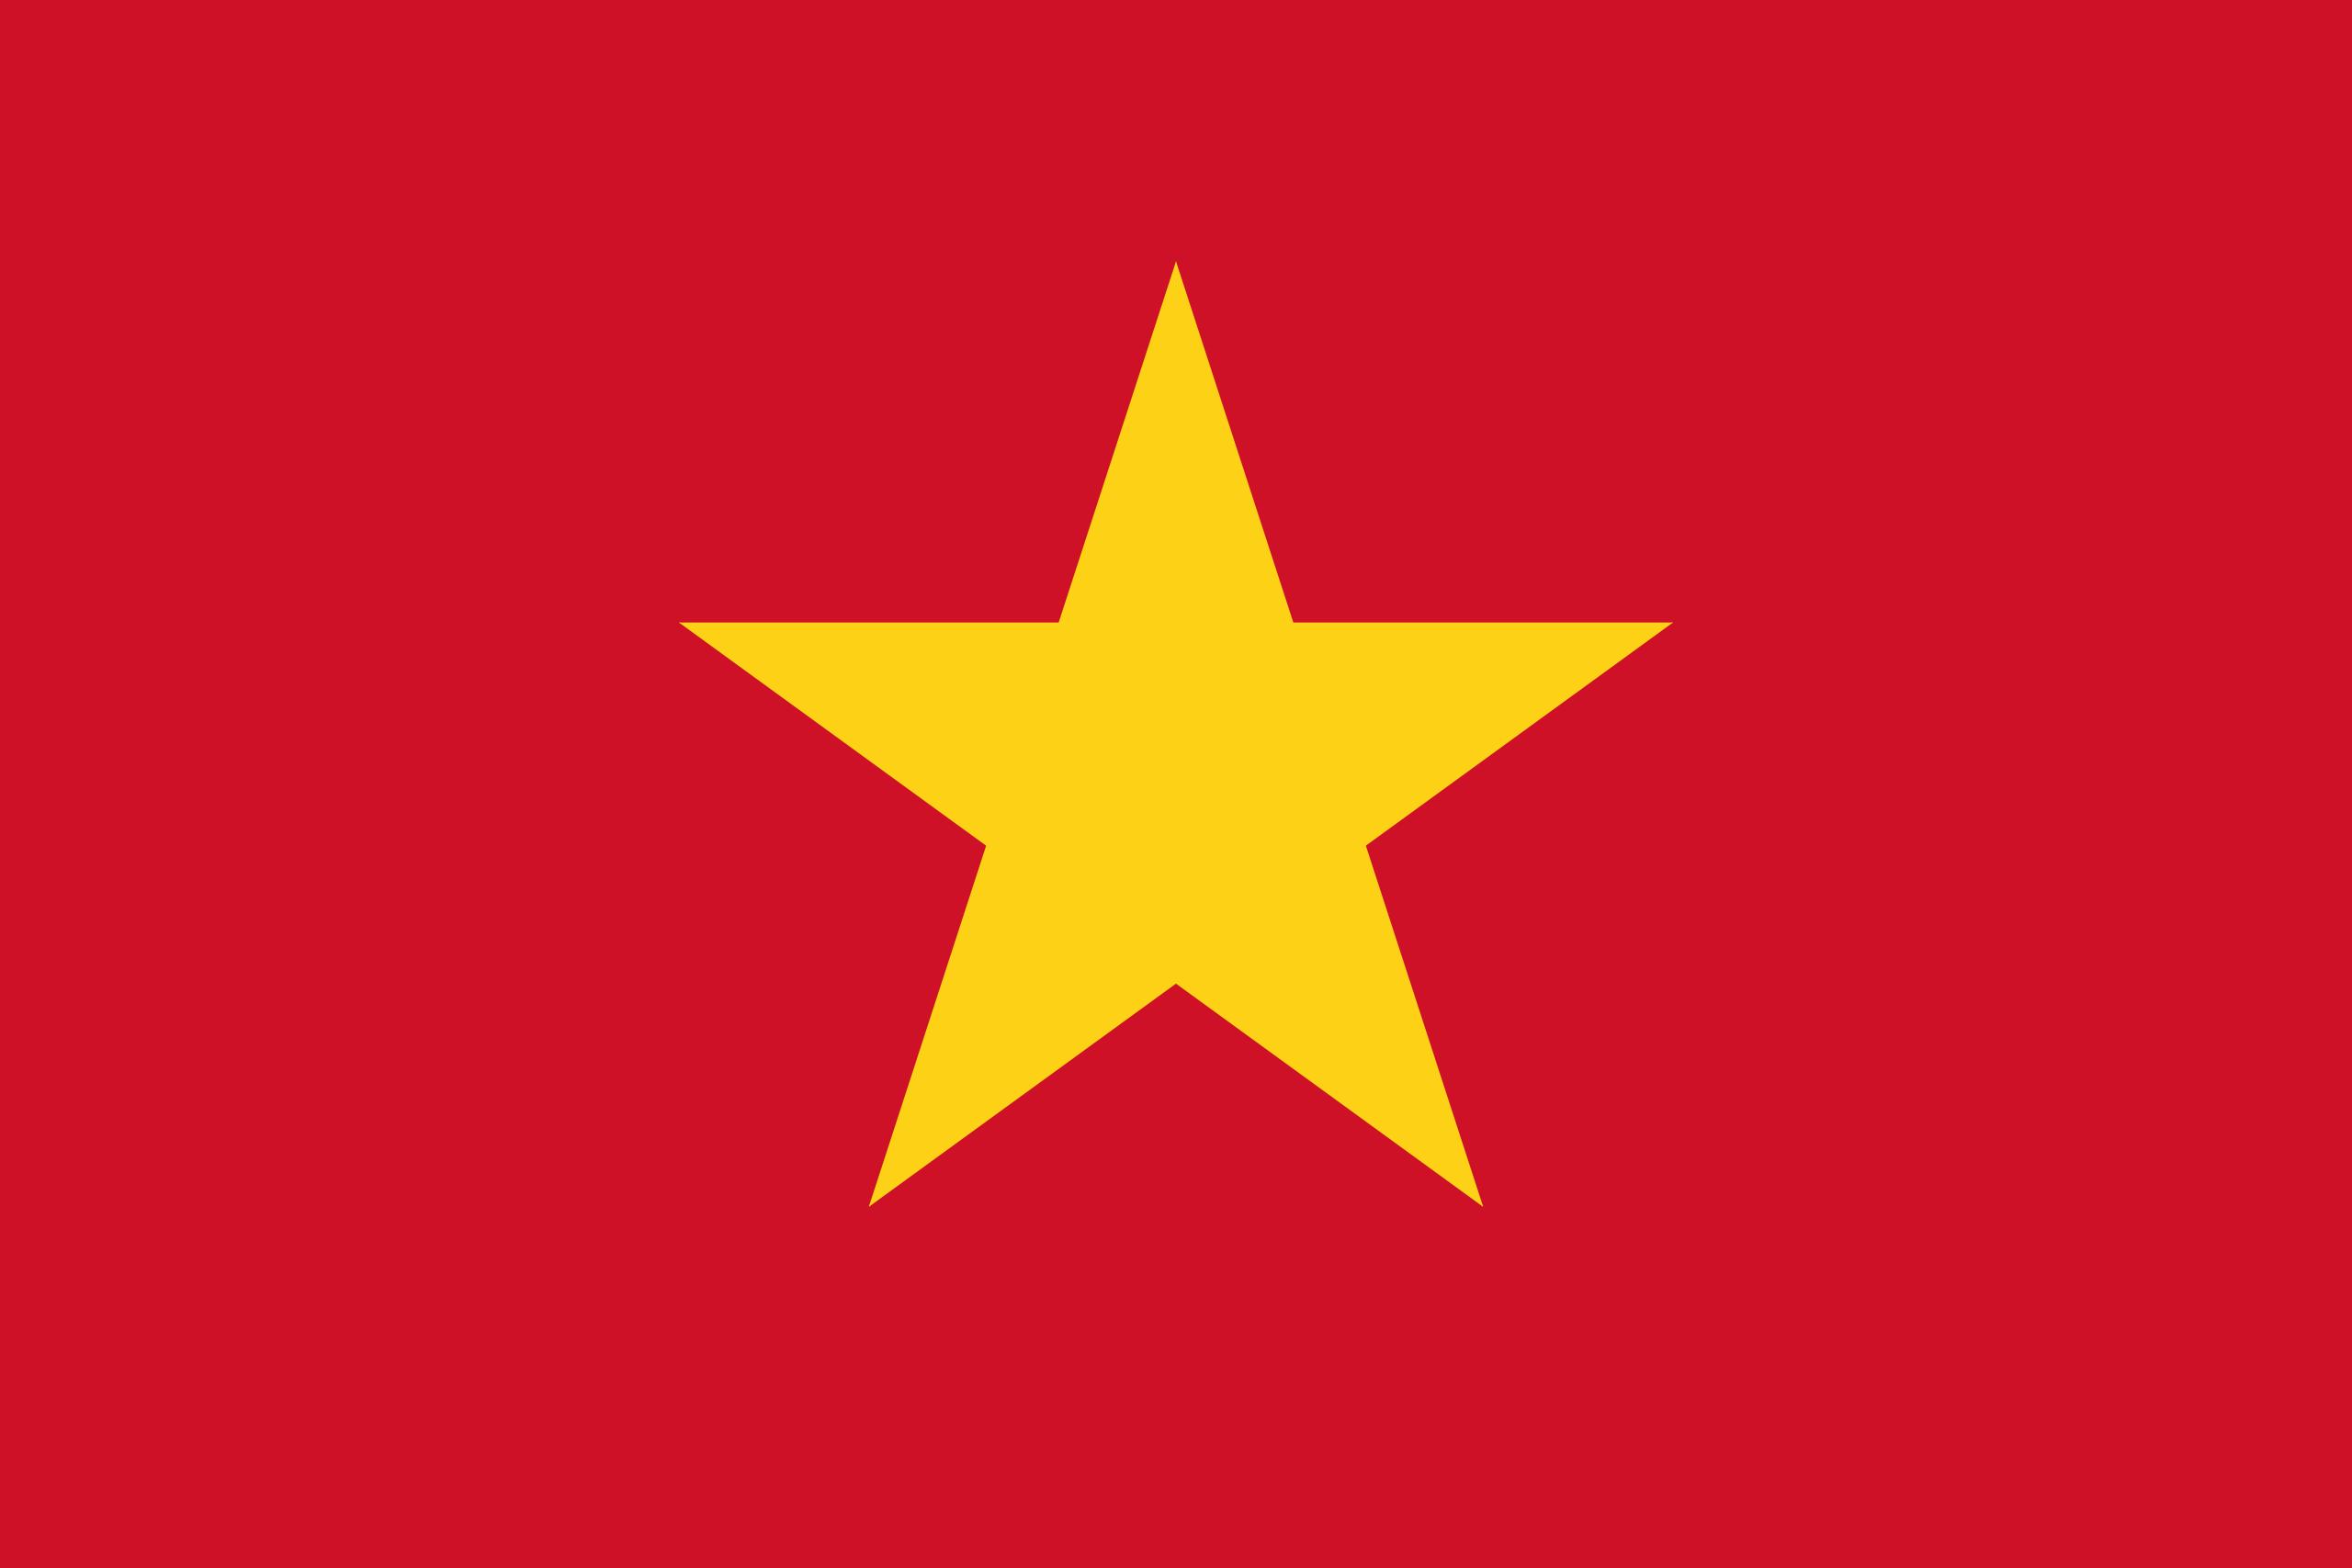 वियतनाम, देश, emblema, लोग�प्रतीकbolo - HD वॉलपेपर - प्रोफेसर-falken.com